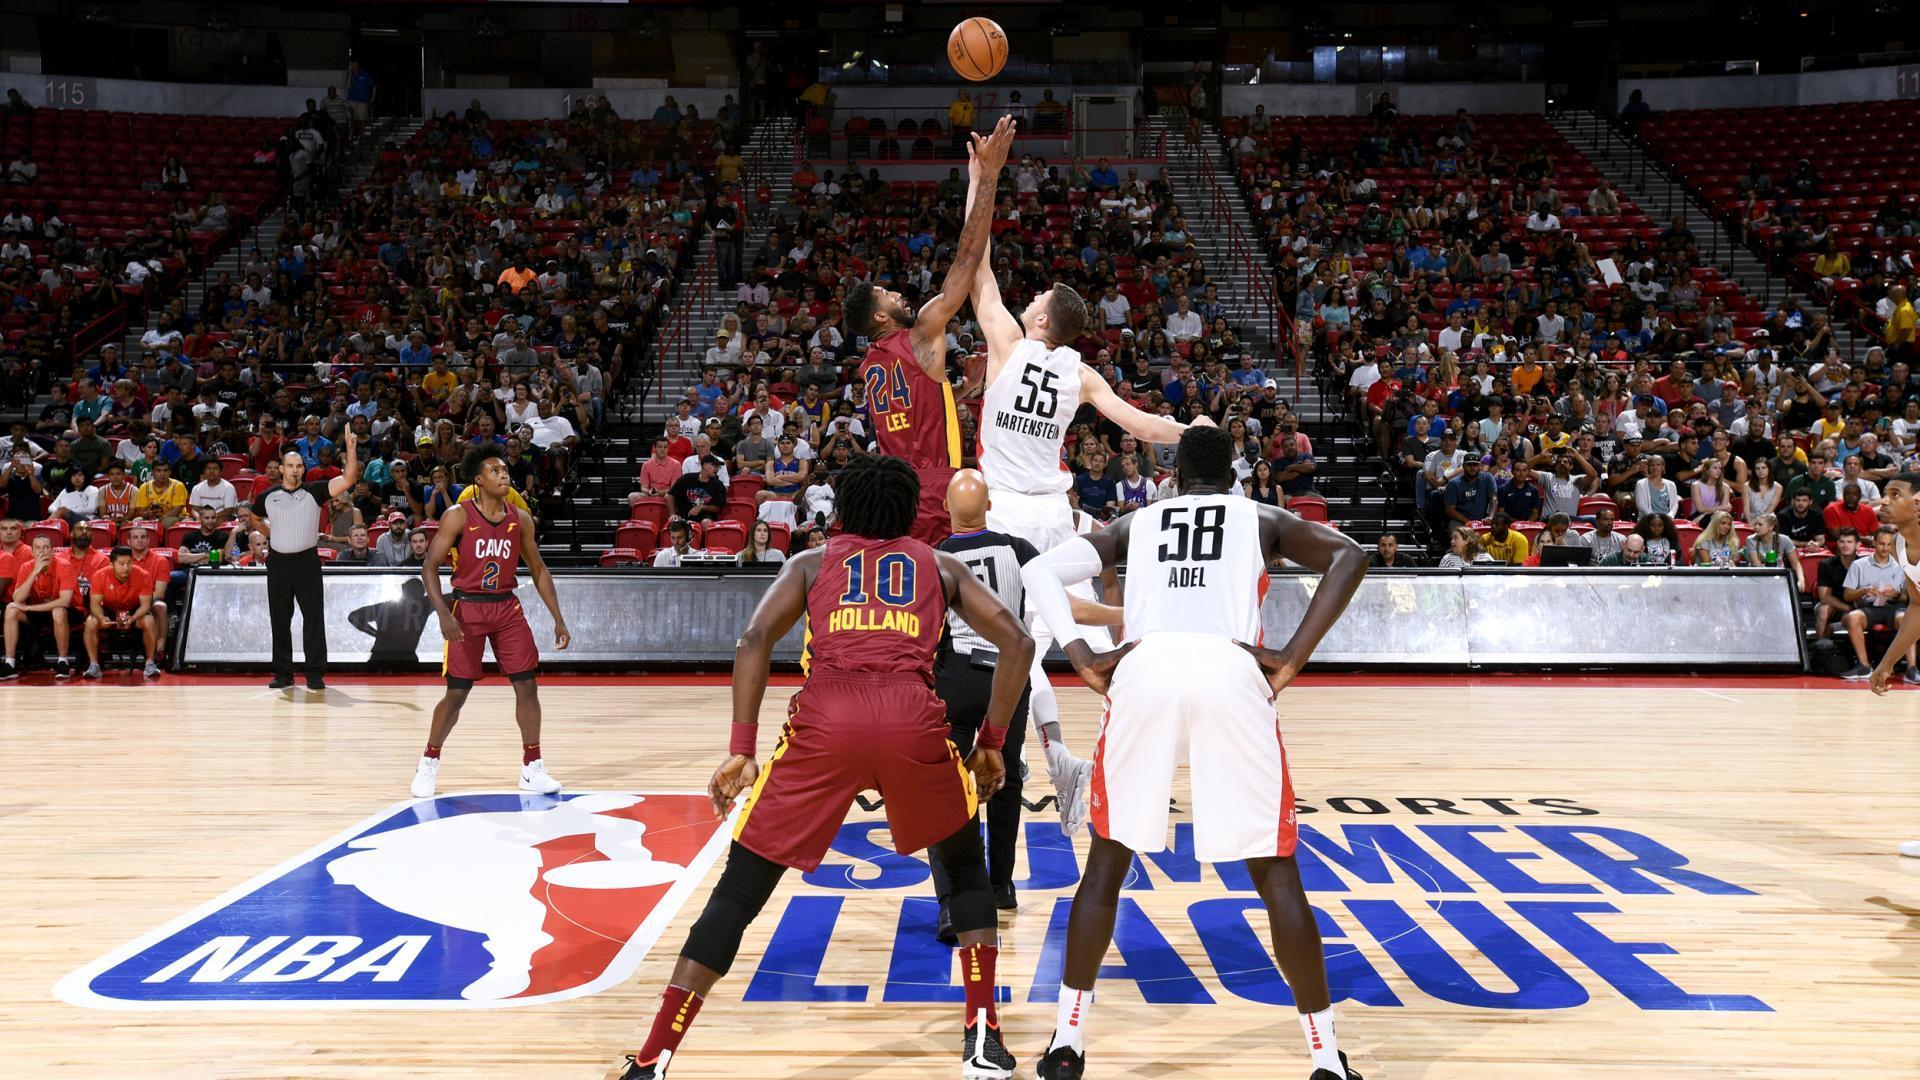 NBA Summer League in Las Vegas